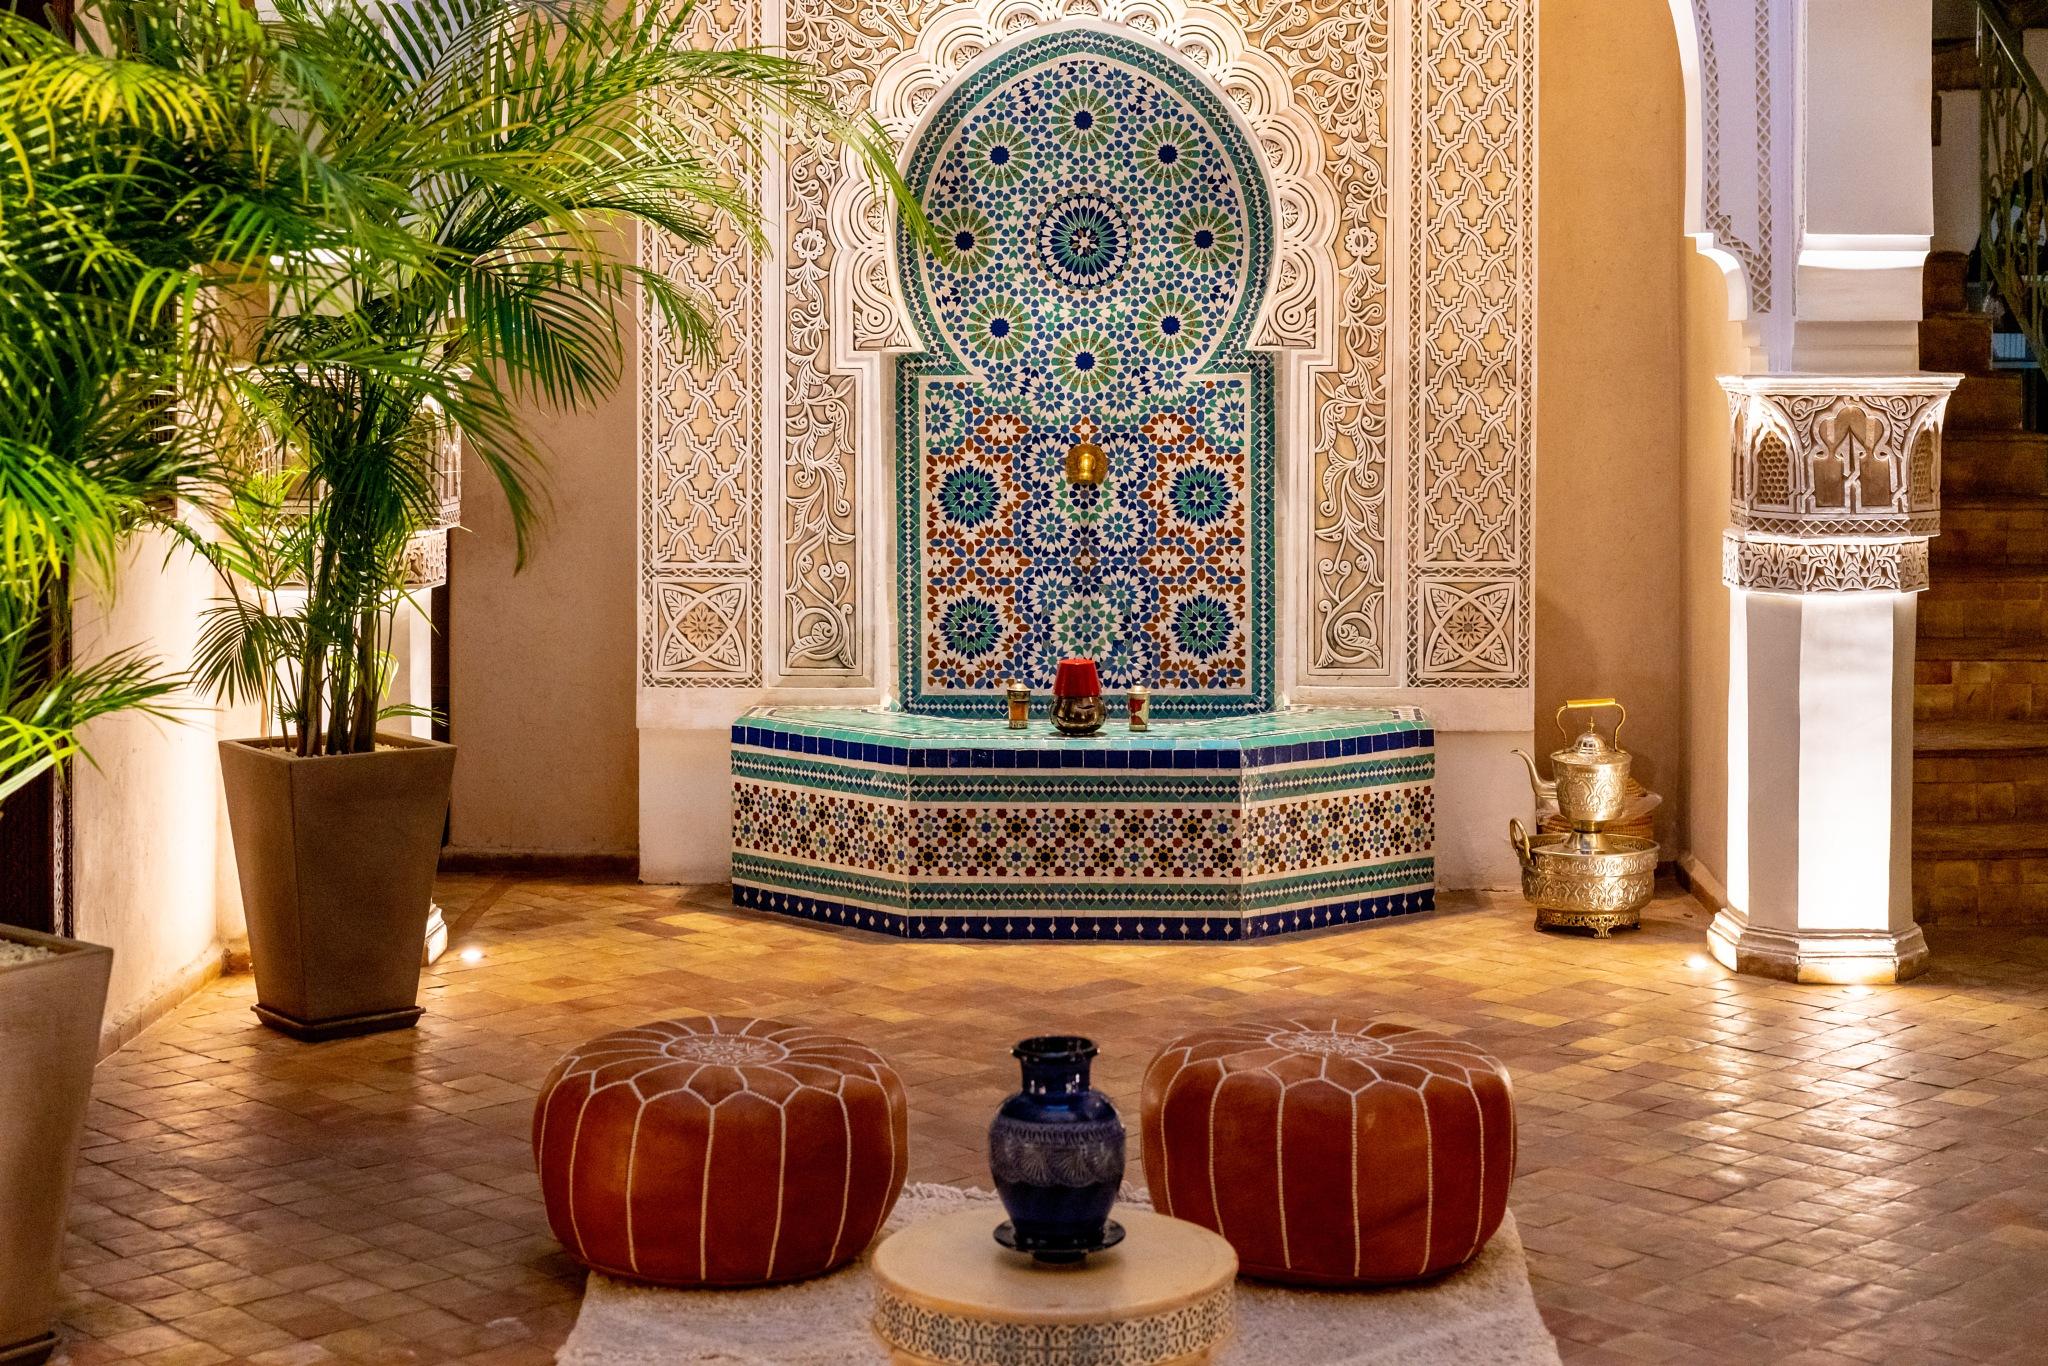 Riad Enchanté, Marrakesh by Andreas Mariotti